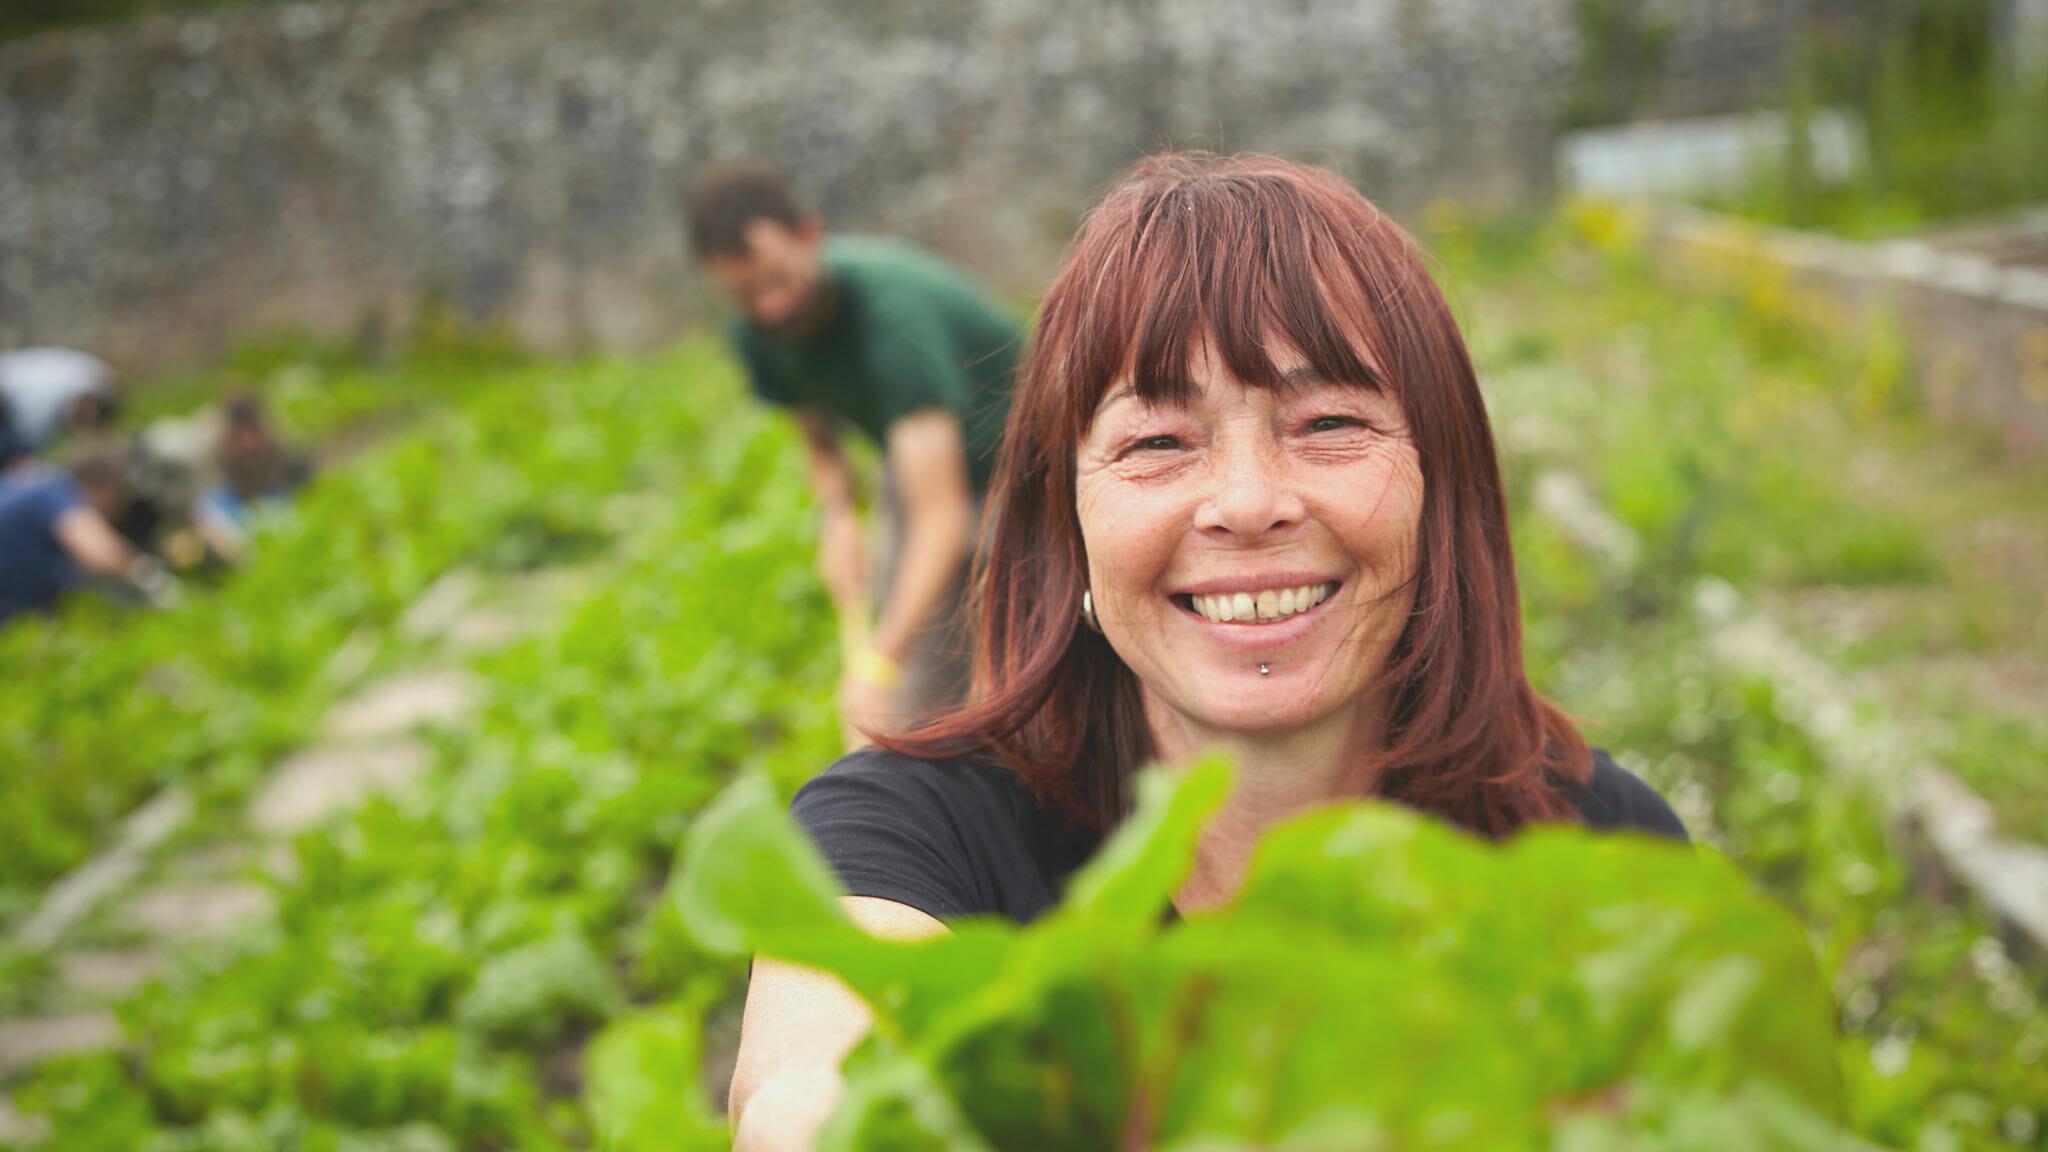 Growing Dartington's historic walled garden